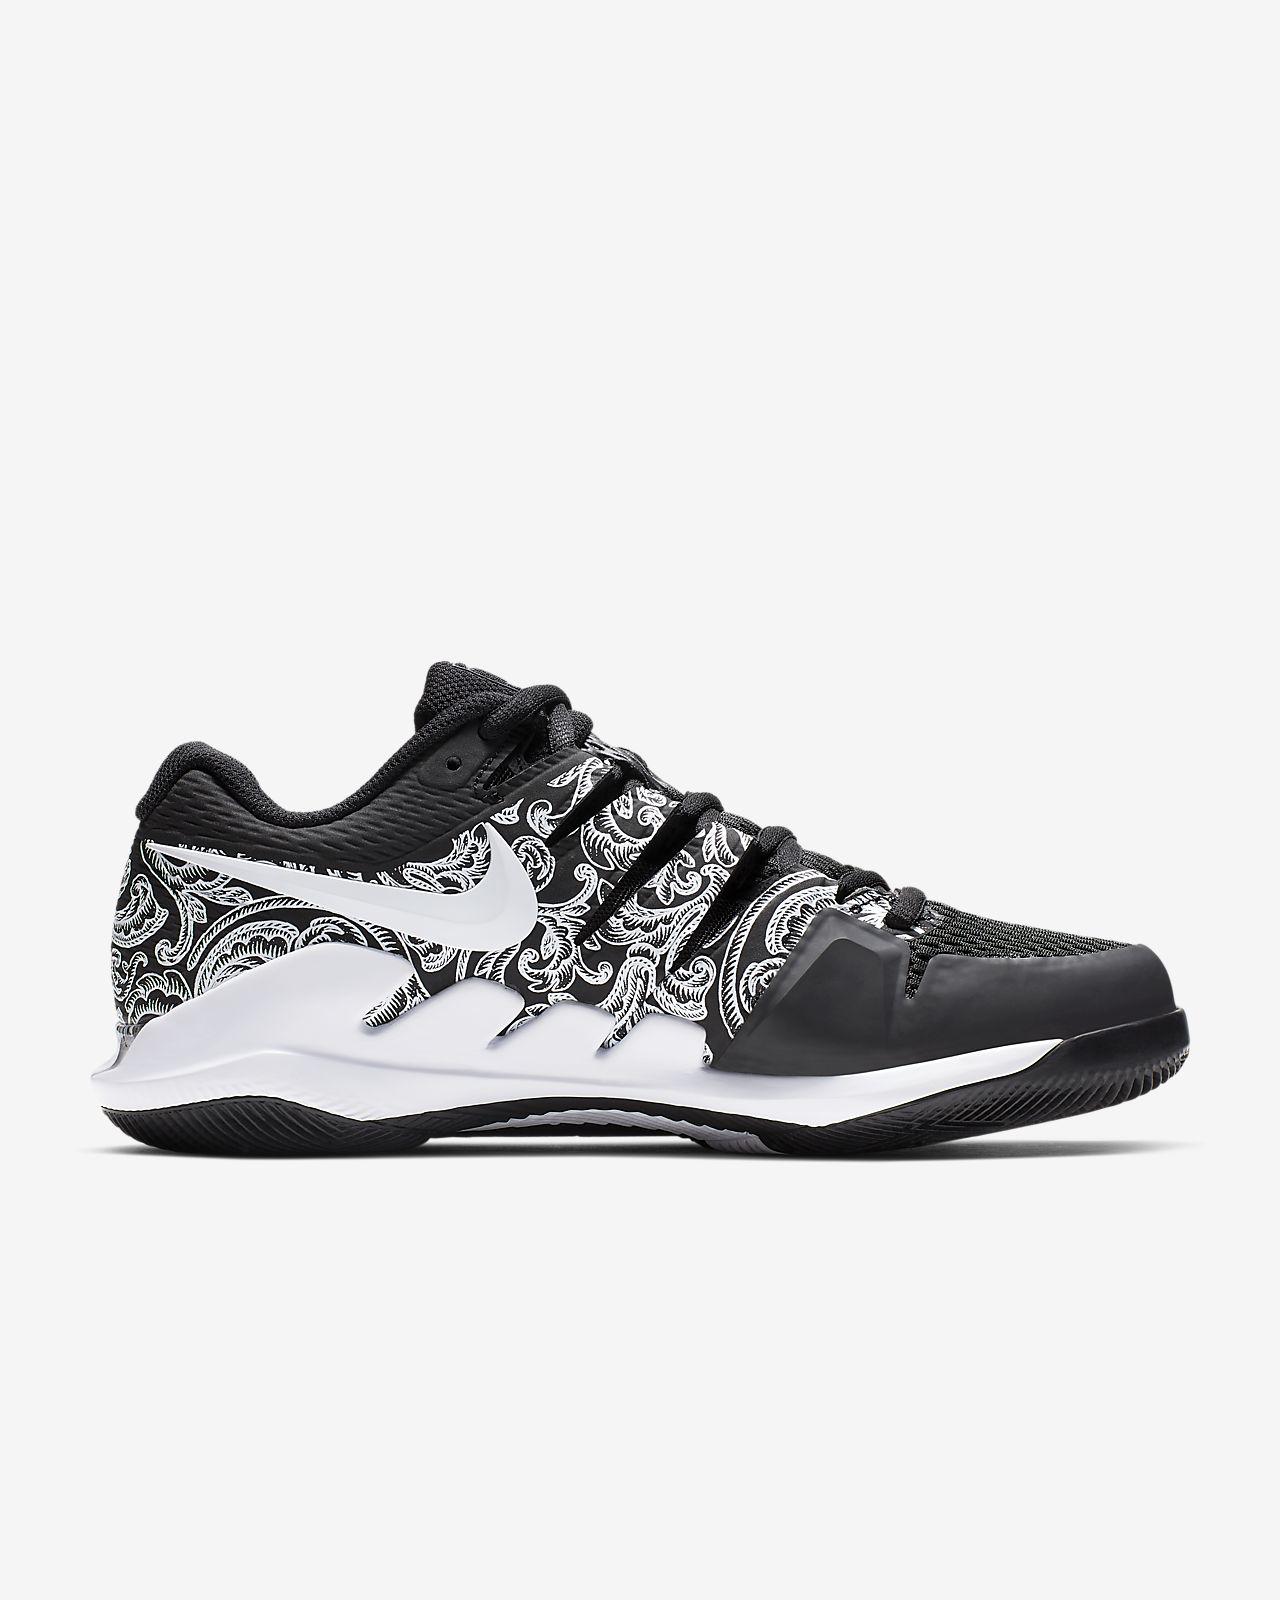 836dea0ddff5d NikeCourt Air Zoom Vapor X Women s Hard Court Tennis Shoe. Nike.com